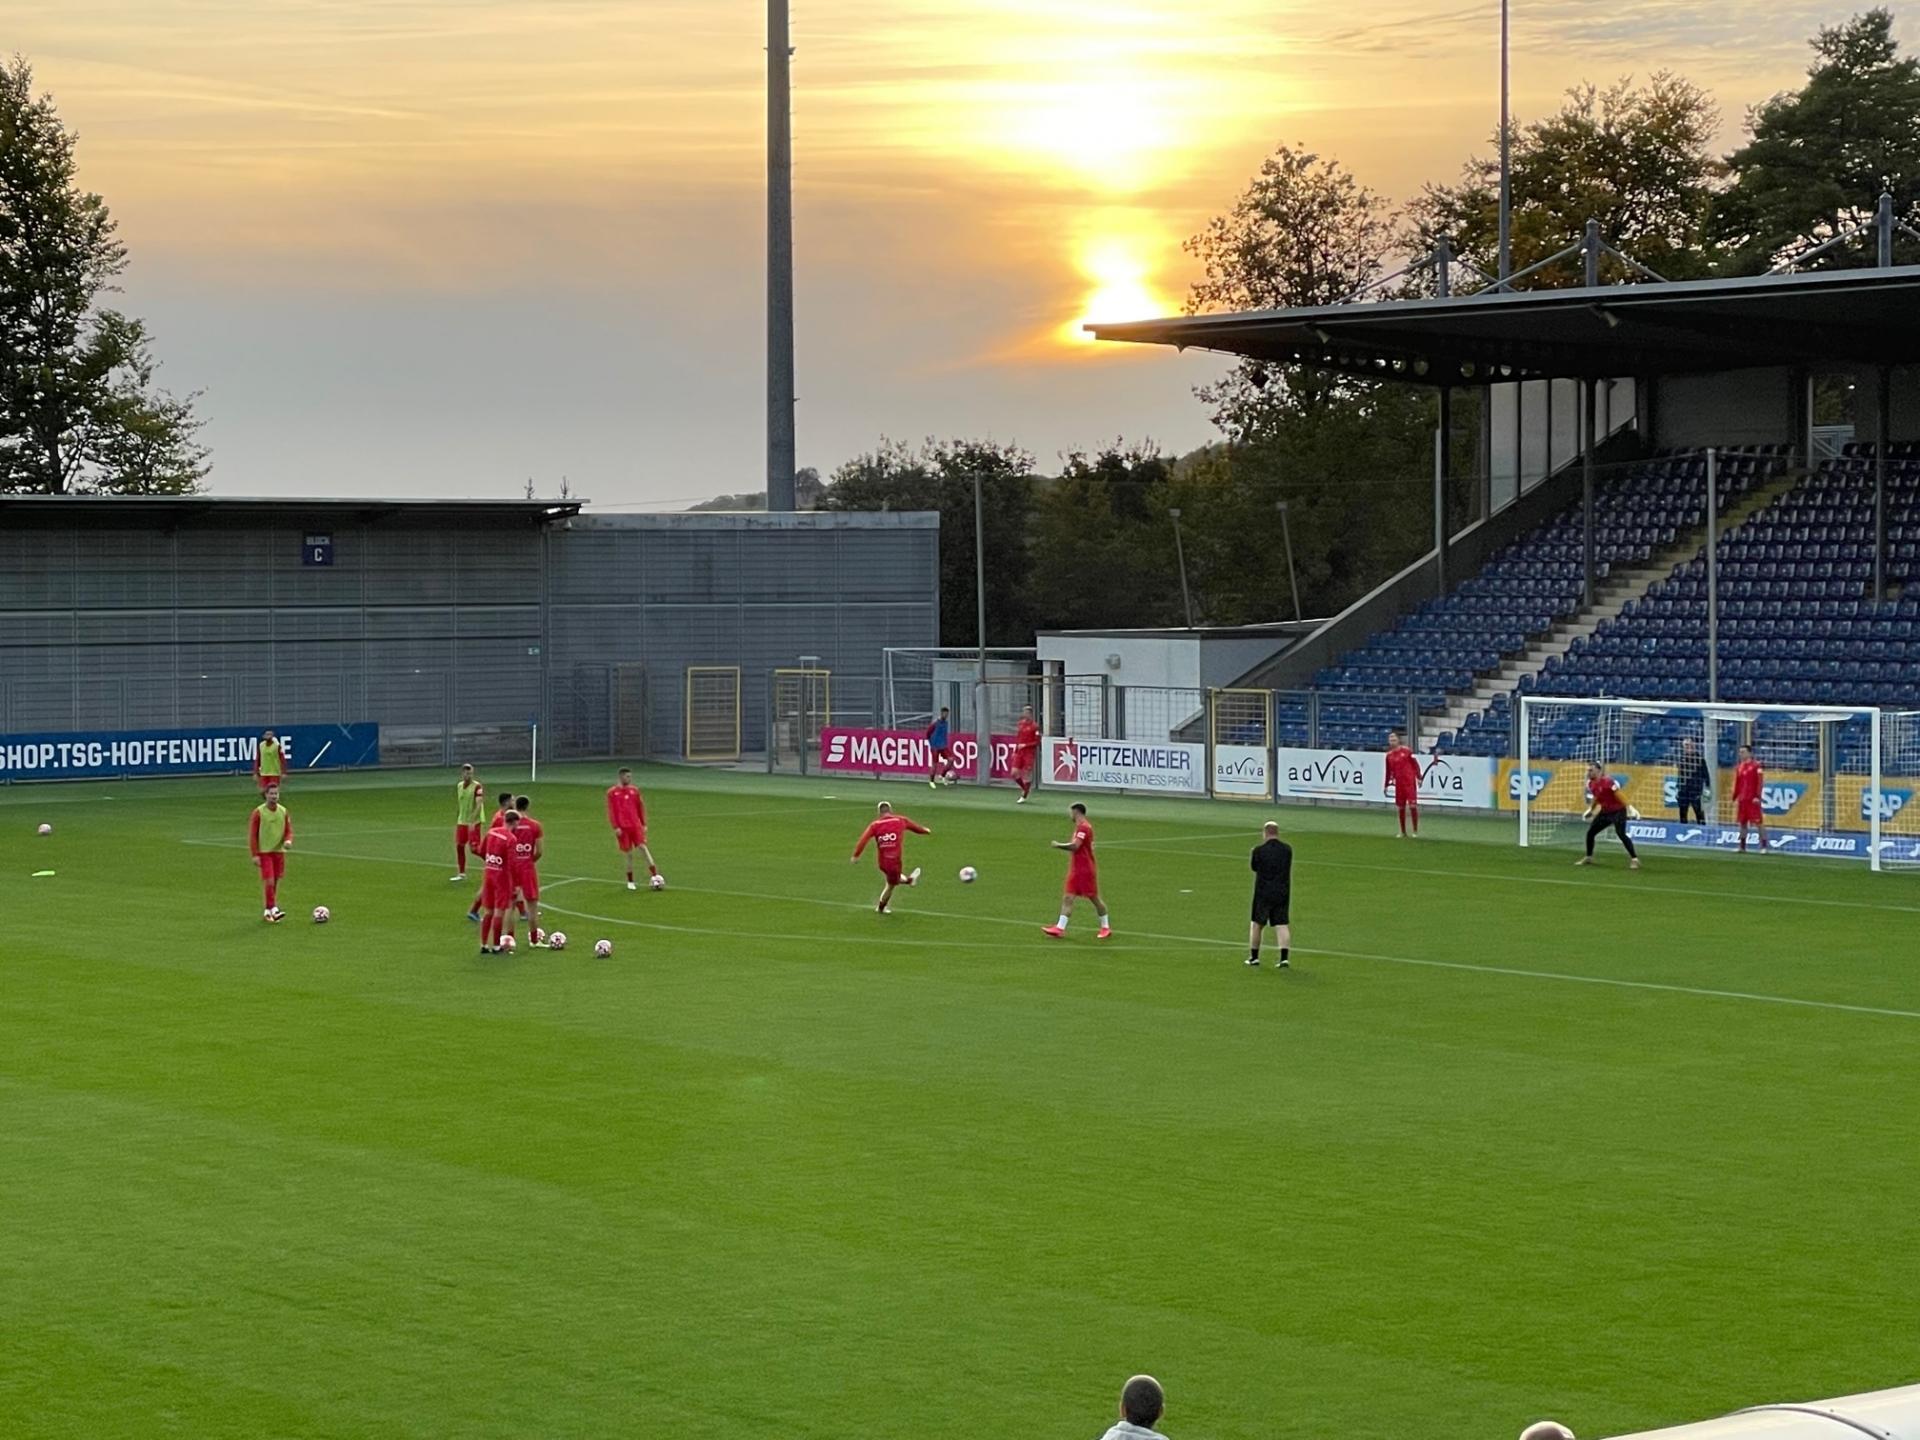 Hoffenheim - KSV